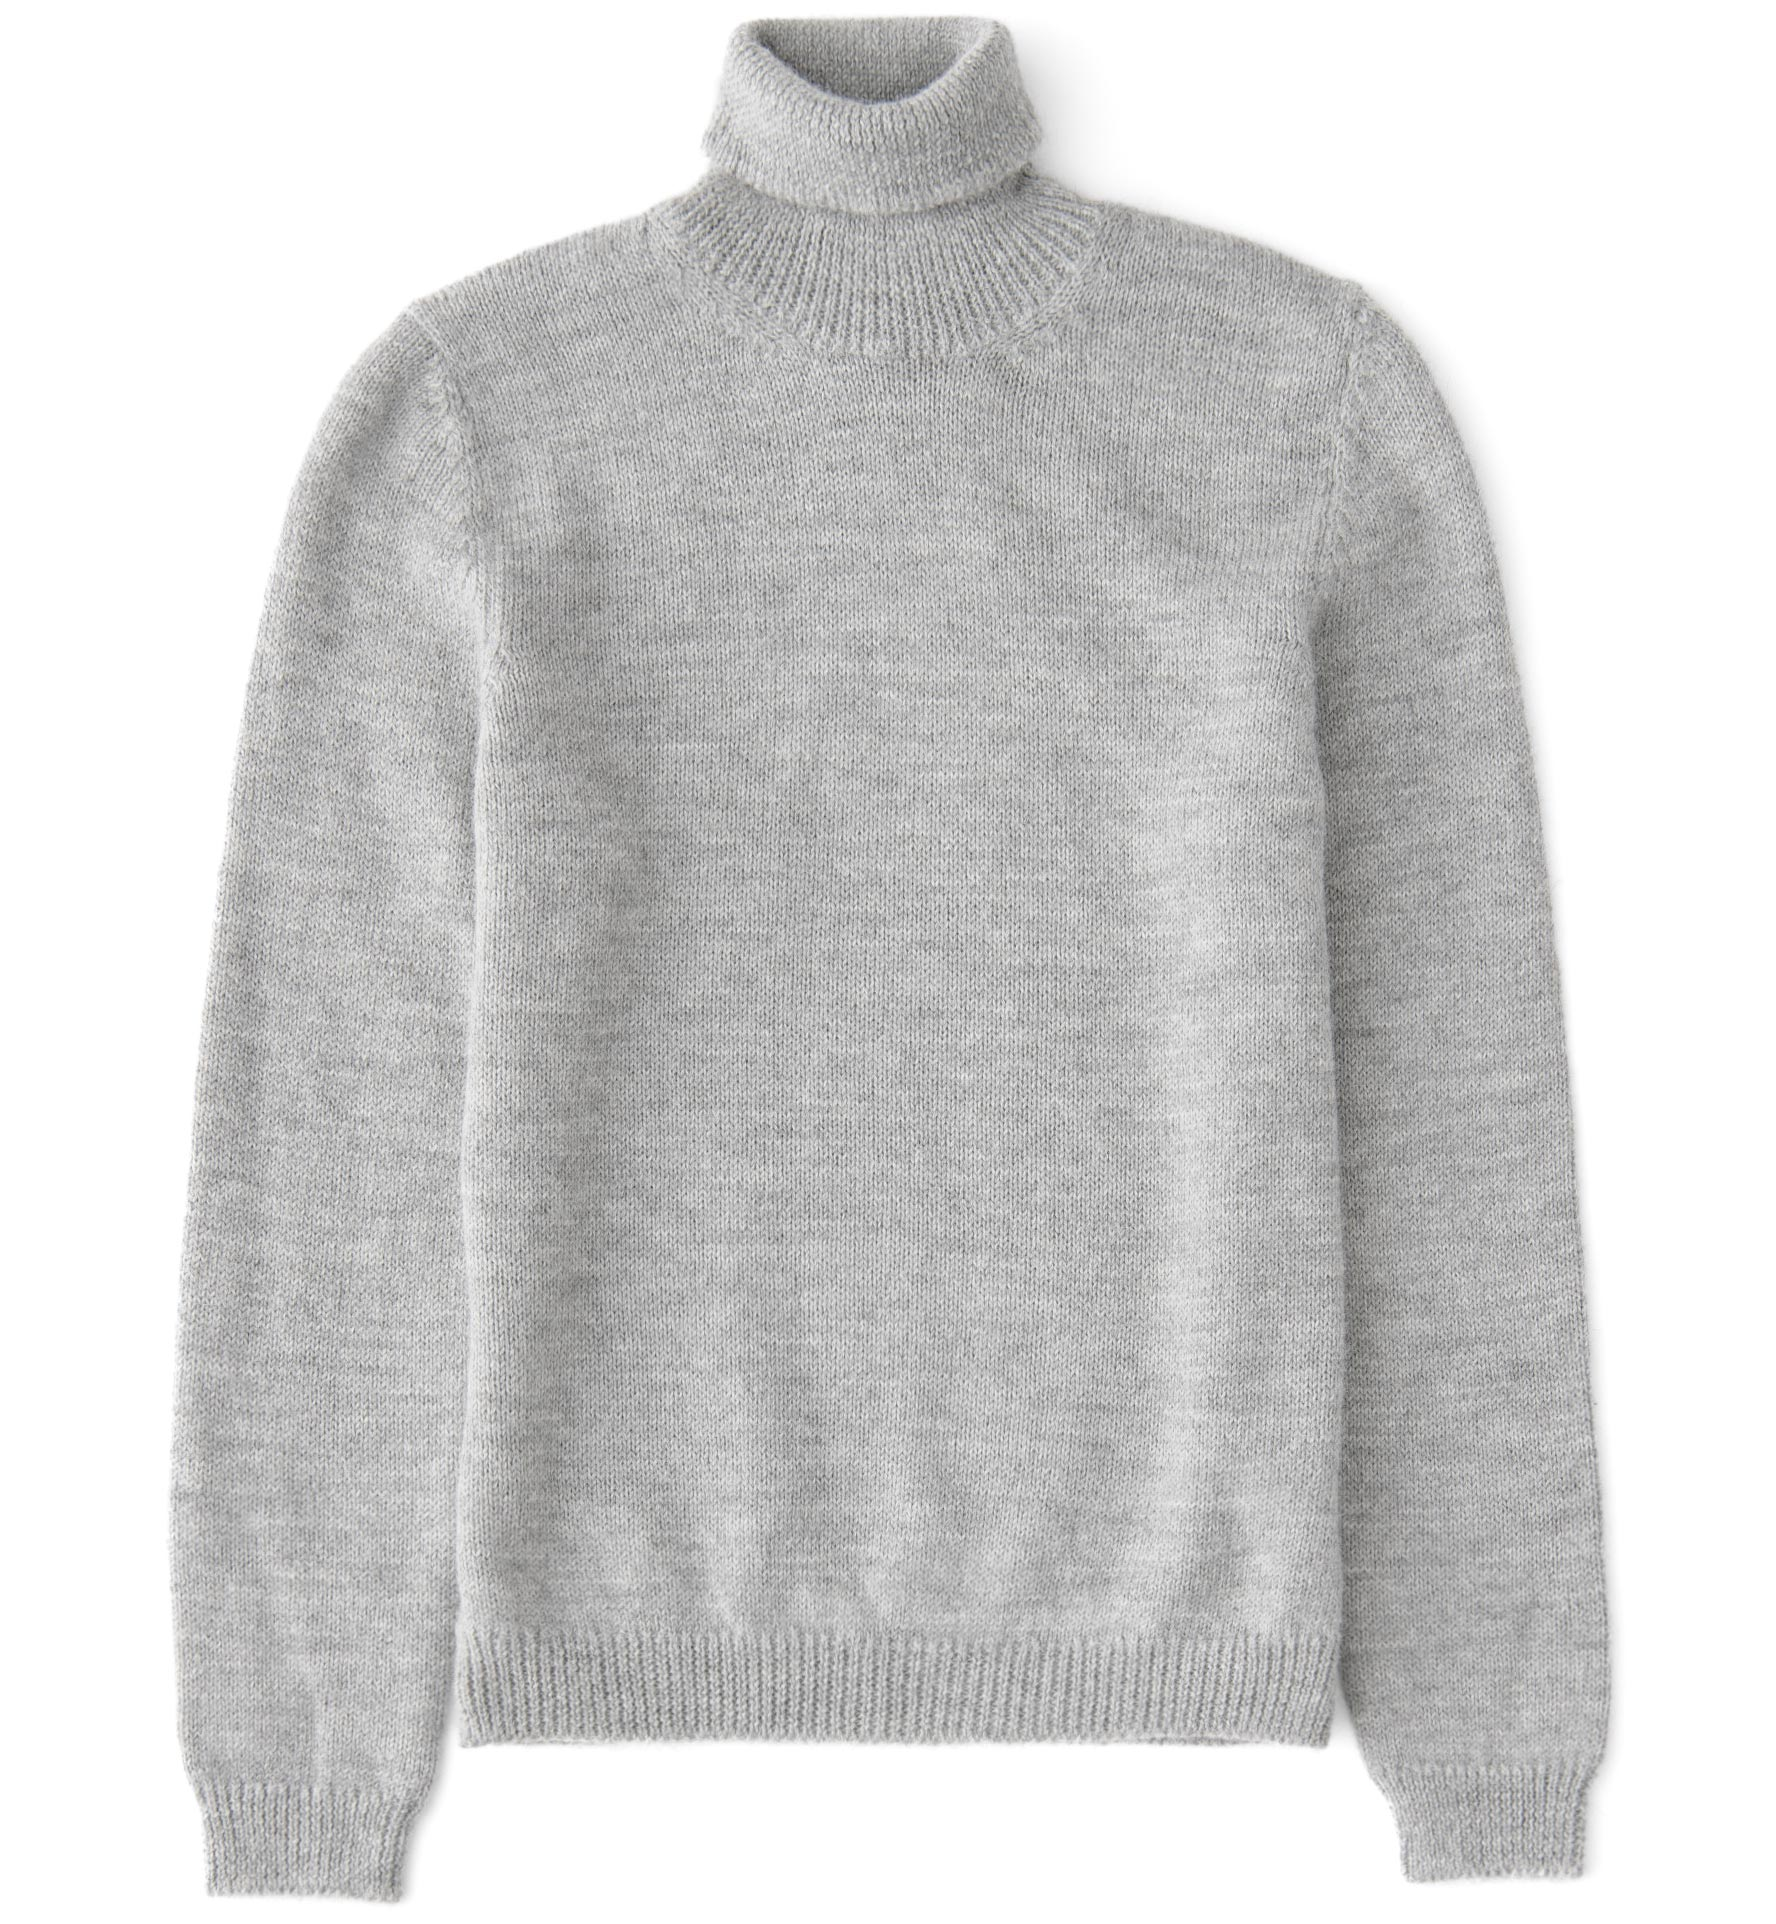 Zoom Image of Grey Melange Wool and Alpaca Turtleneck Sweater